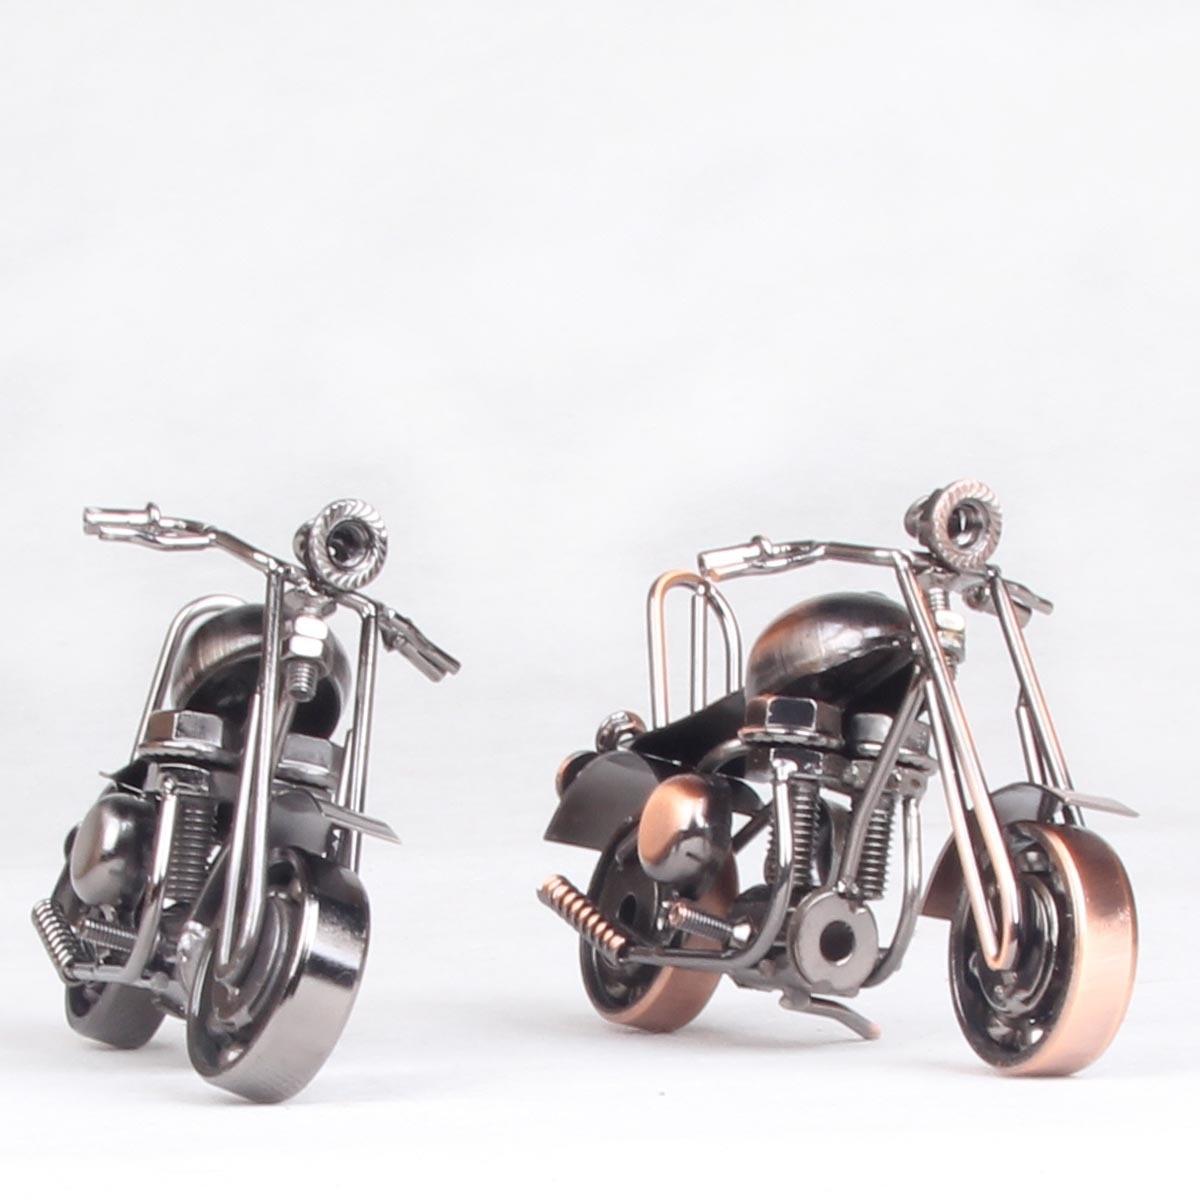 Jam Dinding Berkwalitas. Source · Logam kerajinan trumpet motor model  kerajinan hadiah ornamen kerajinan besi f5722e957a